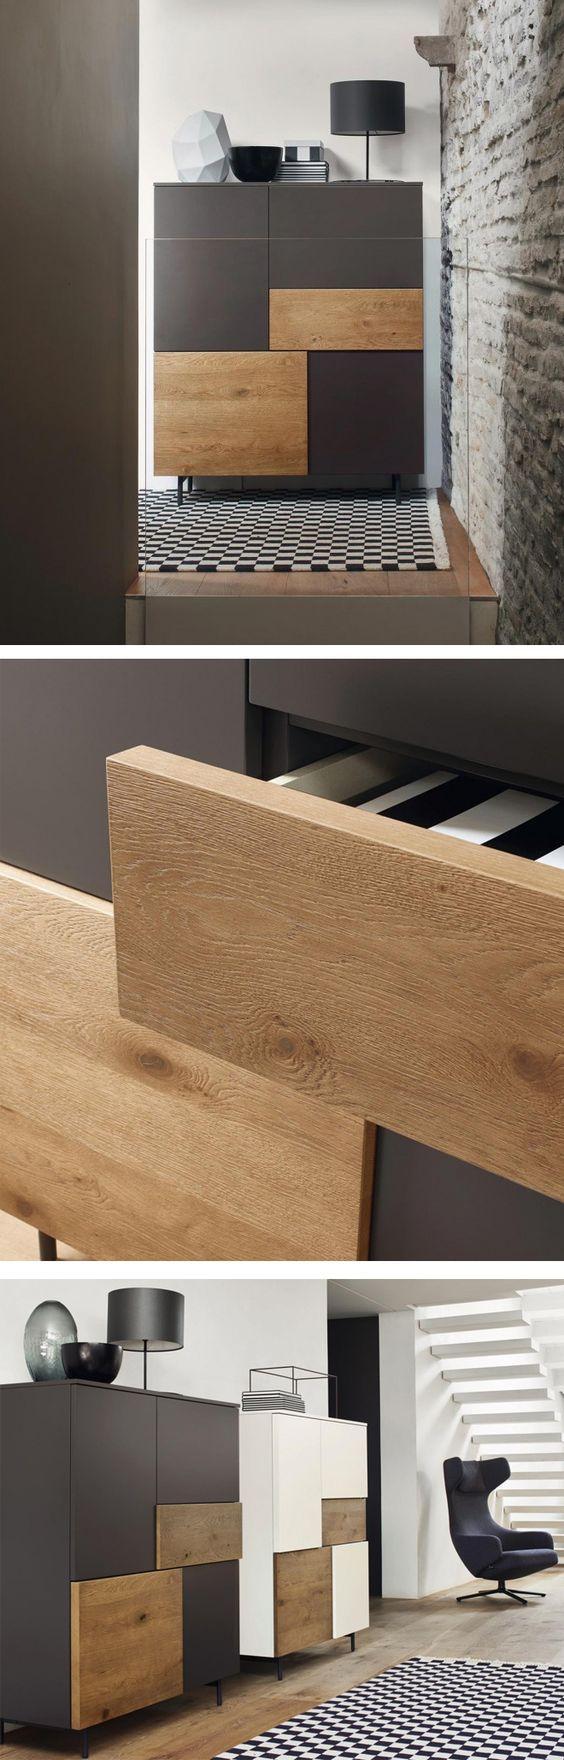 Küchen-designmöbel livitalia highboard incontro  ikea hack saunas and buffet